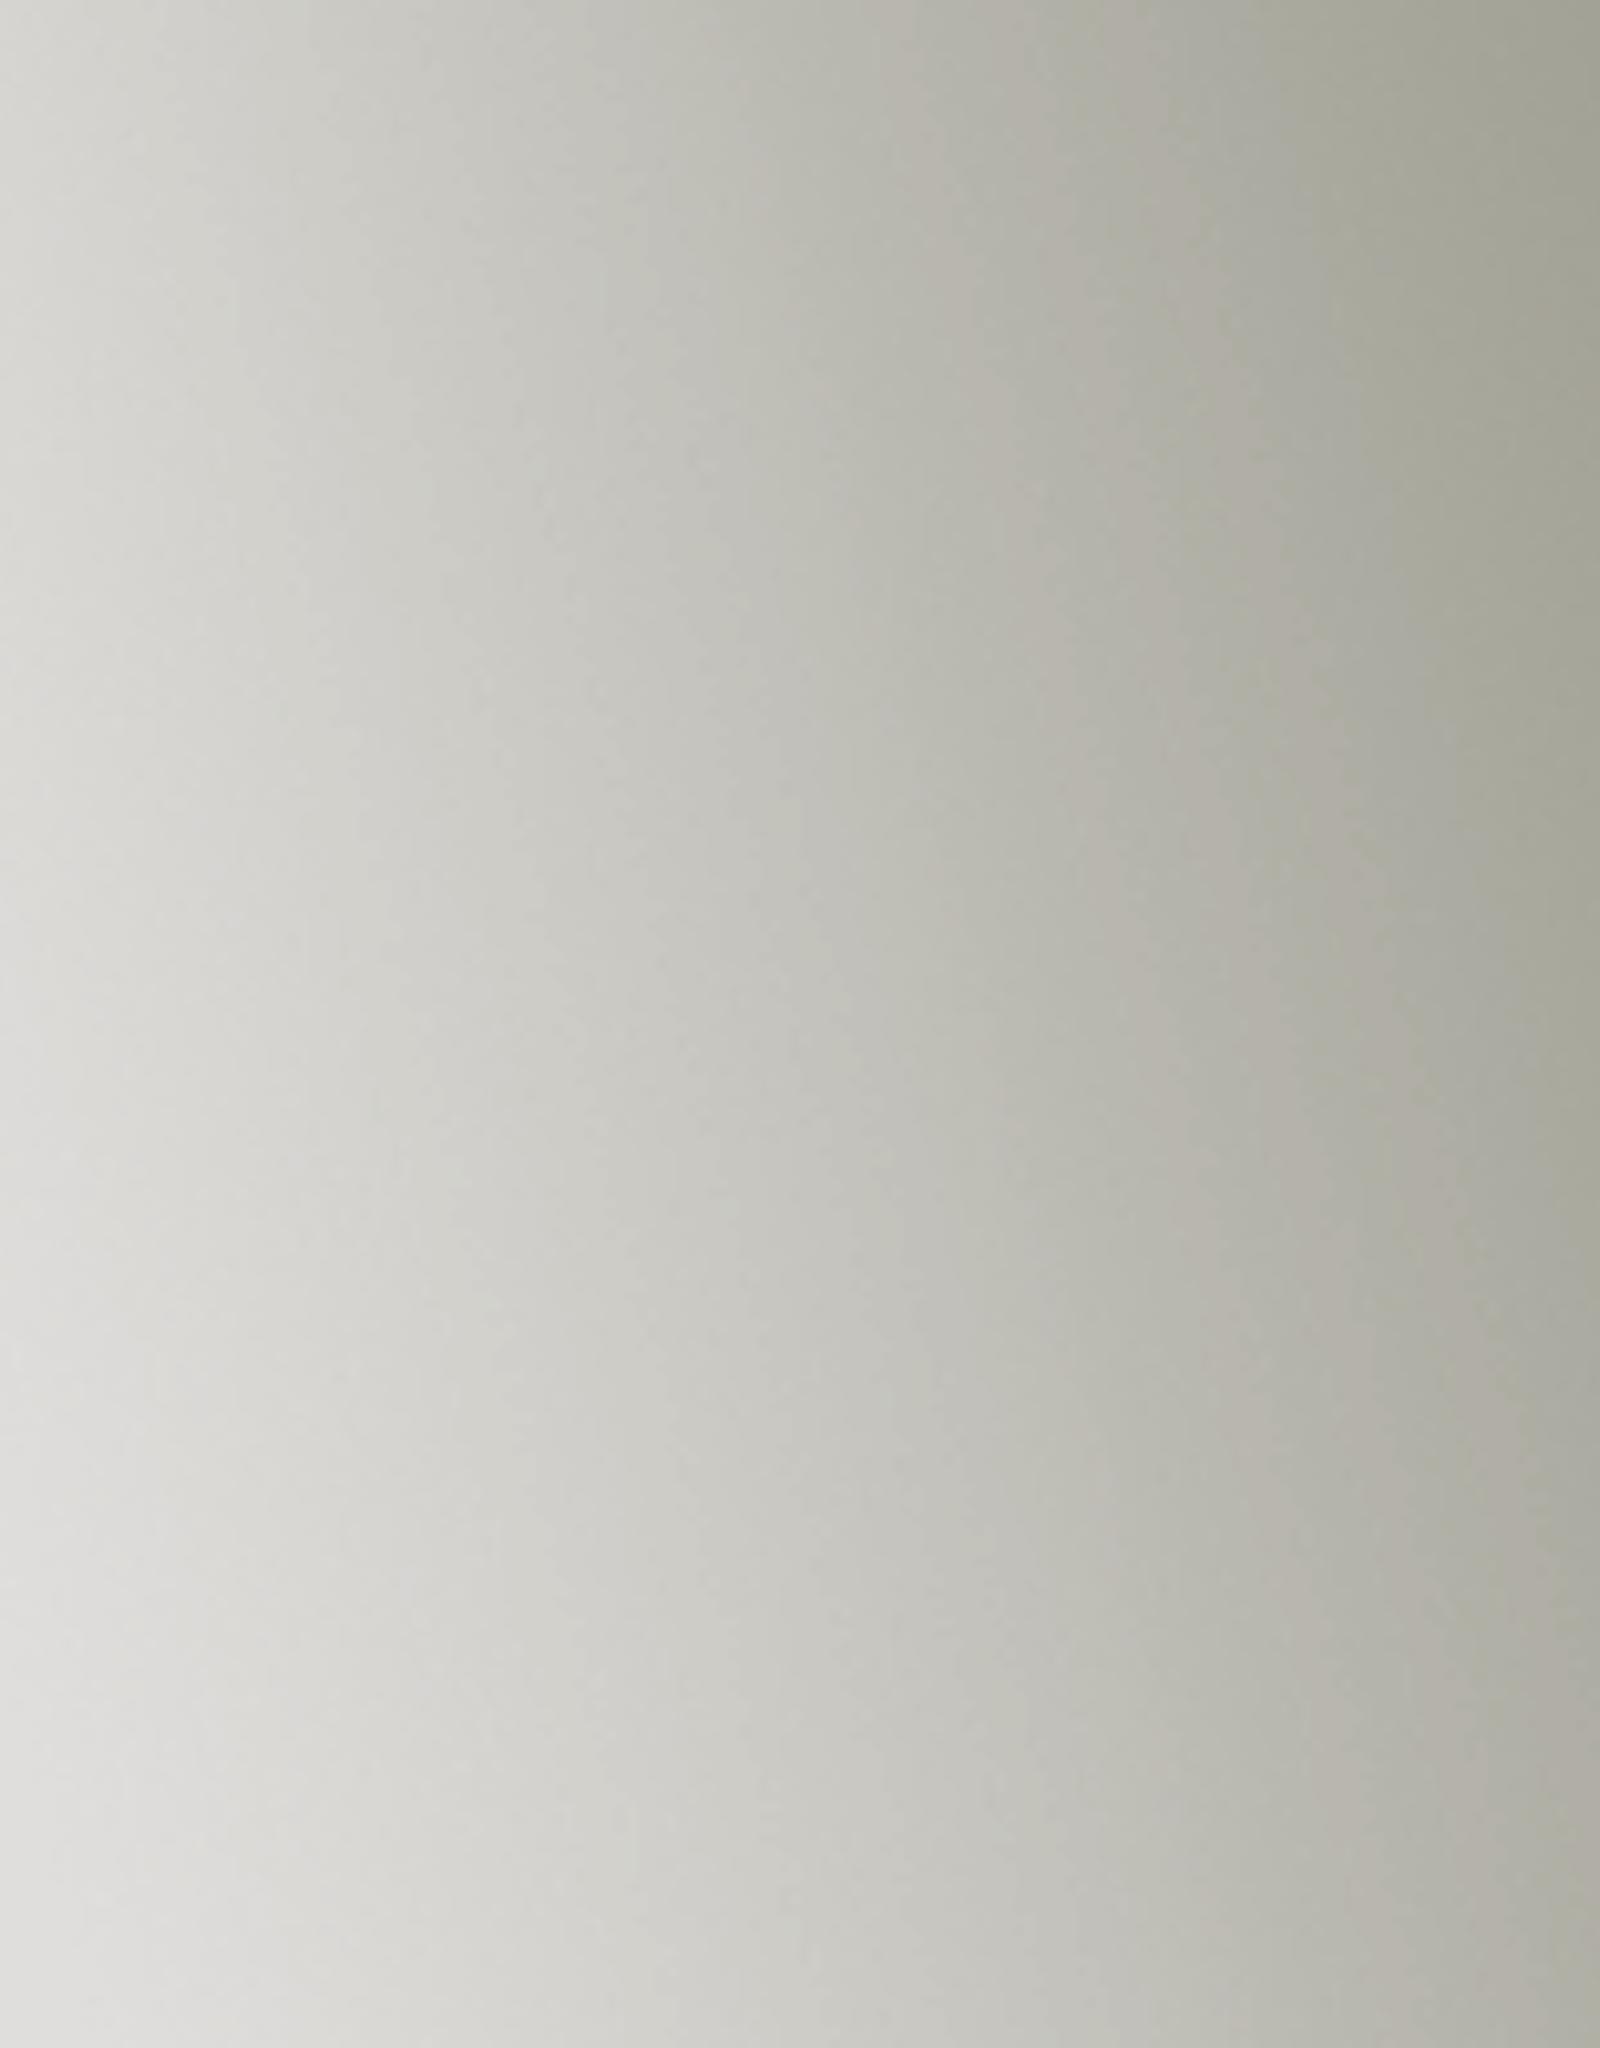 Fluid Acrylics Series 5 Irides Stainless Steel (Coarse) 4oz